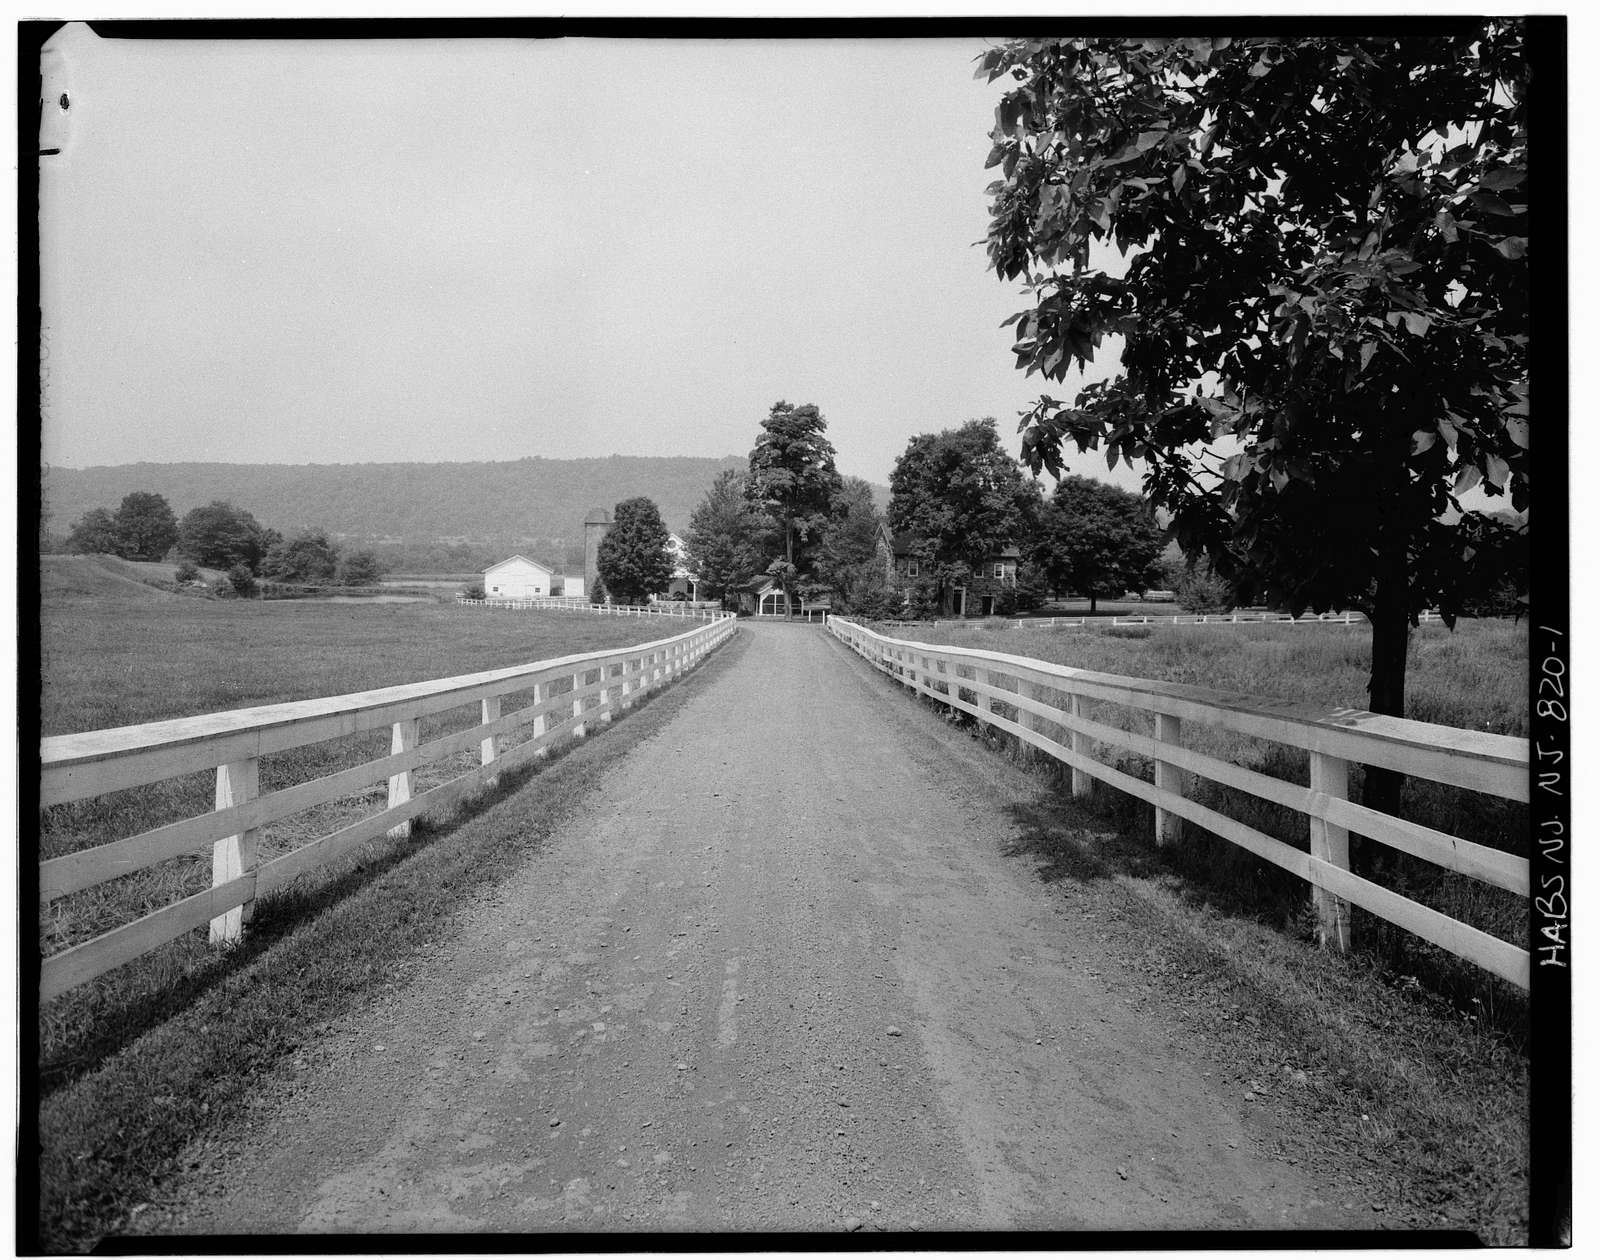 Daniel Shoemaker Farm, Mountain Road, Wallpack Center, Sussex County, NJ